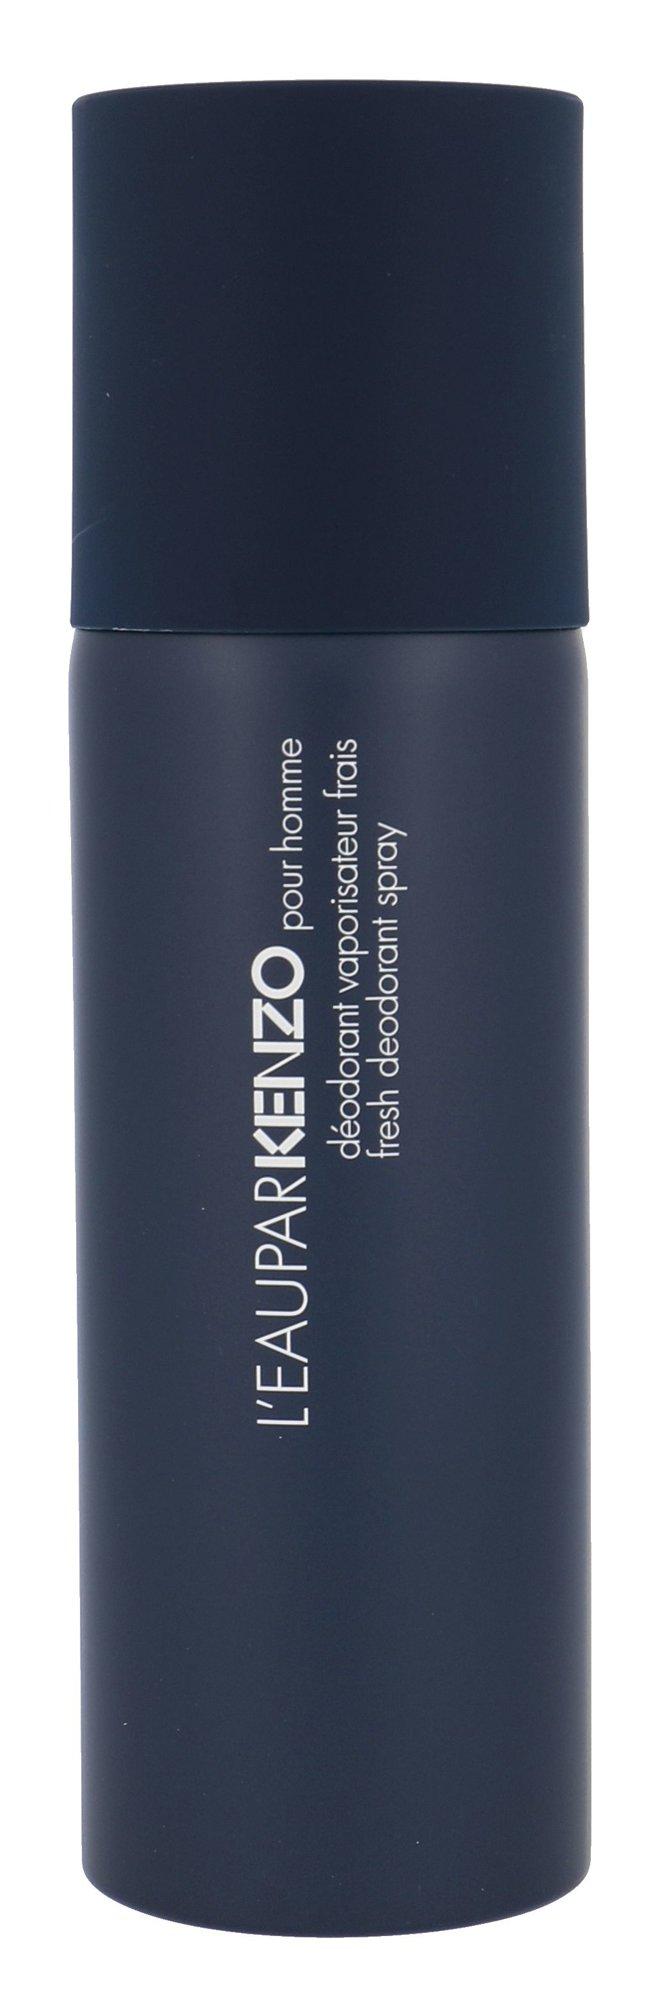 KENZO L´Eau Kenzo Pour Homme Deodorant 150ml